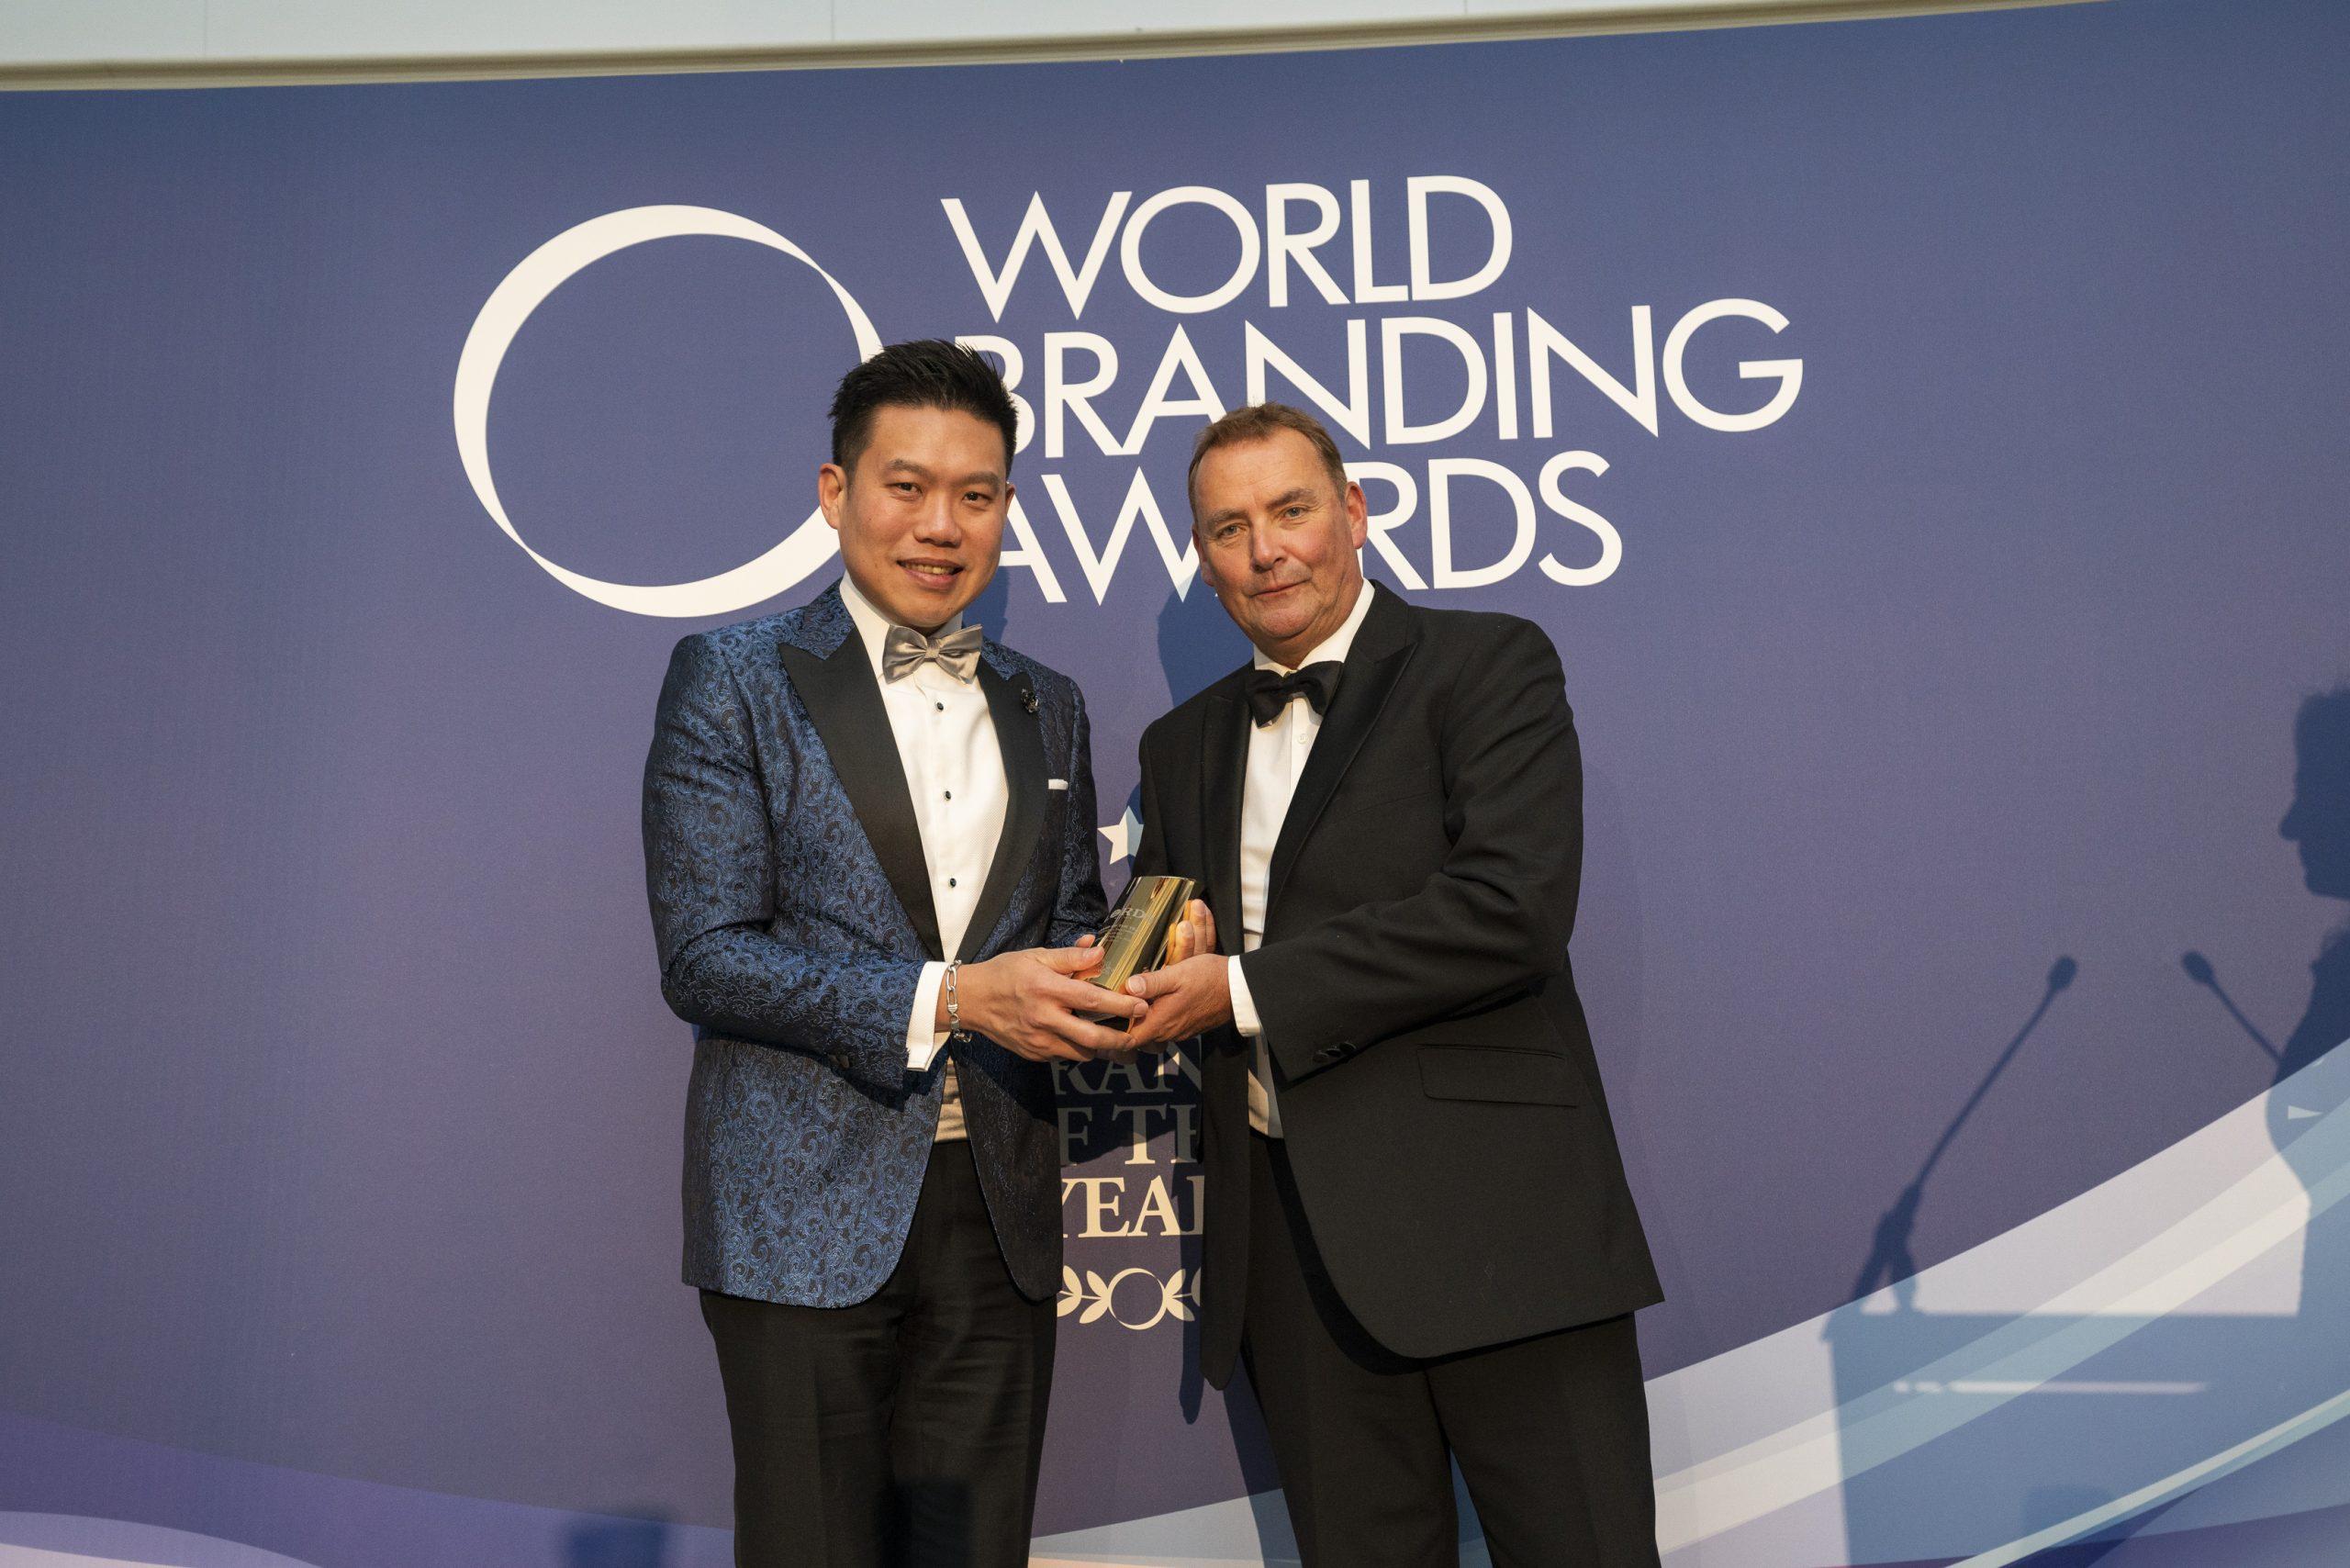 LORD's Tailor wins World Branding Awards